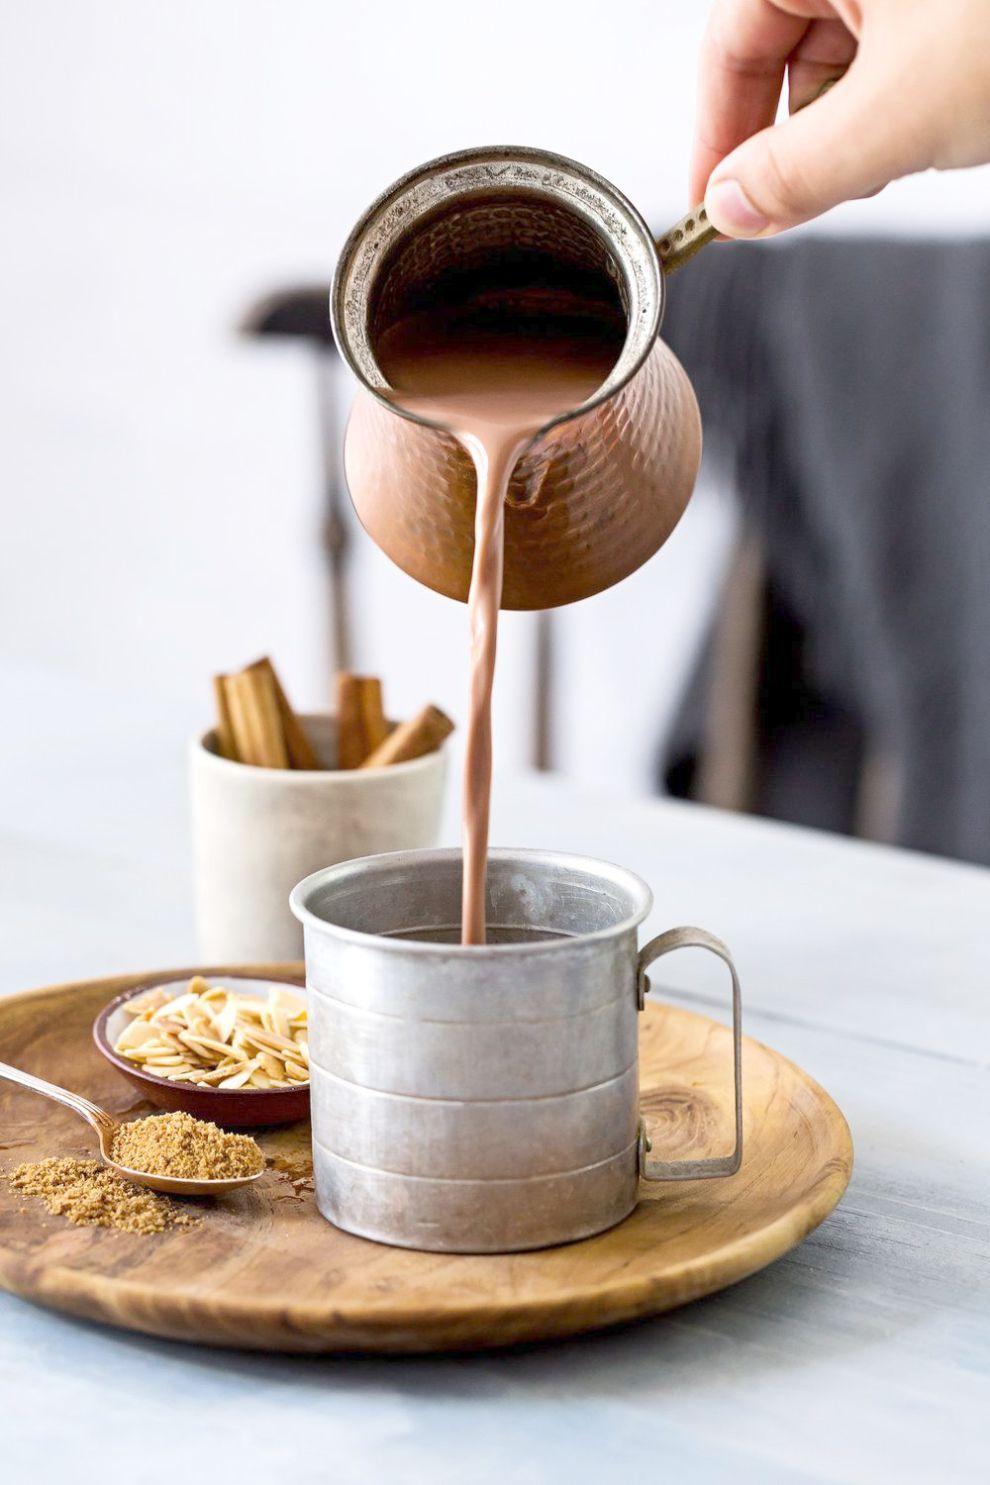 Coffee Bean Menu All Day Breakfast Of Coffee Bean Promo Code Refer A Friend Above Coffee Near Me Sava Diy Food Recipes Yummy Food Dessert Alcohol Drink Recipes